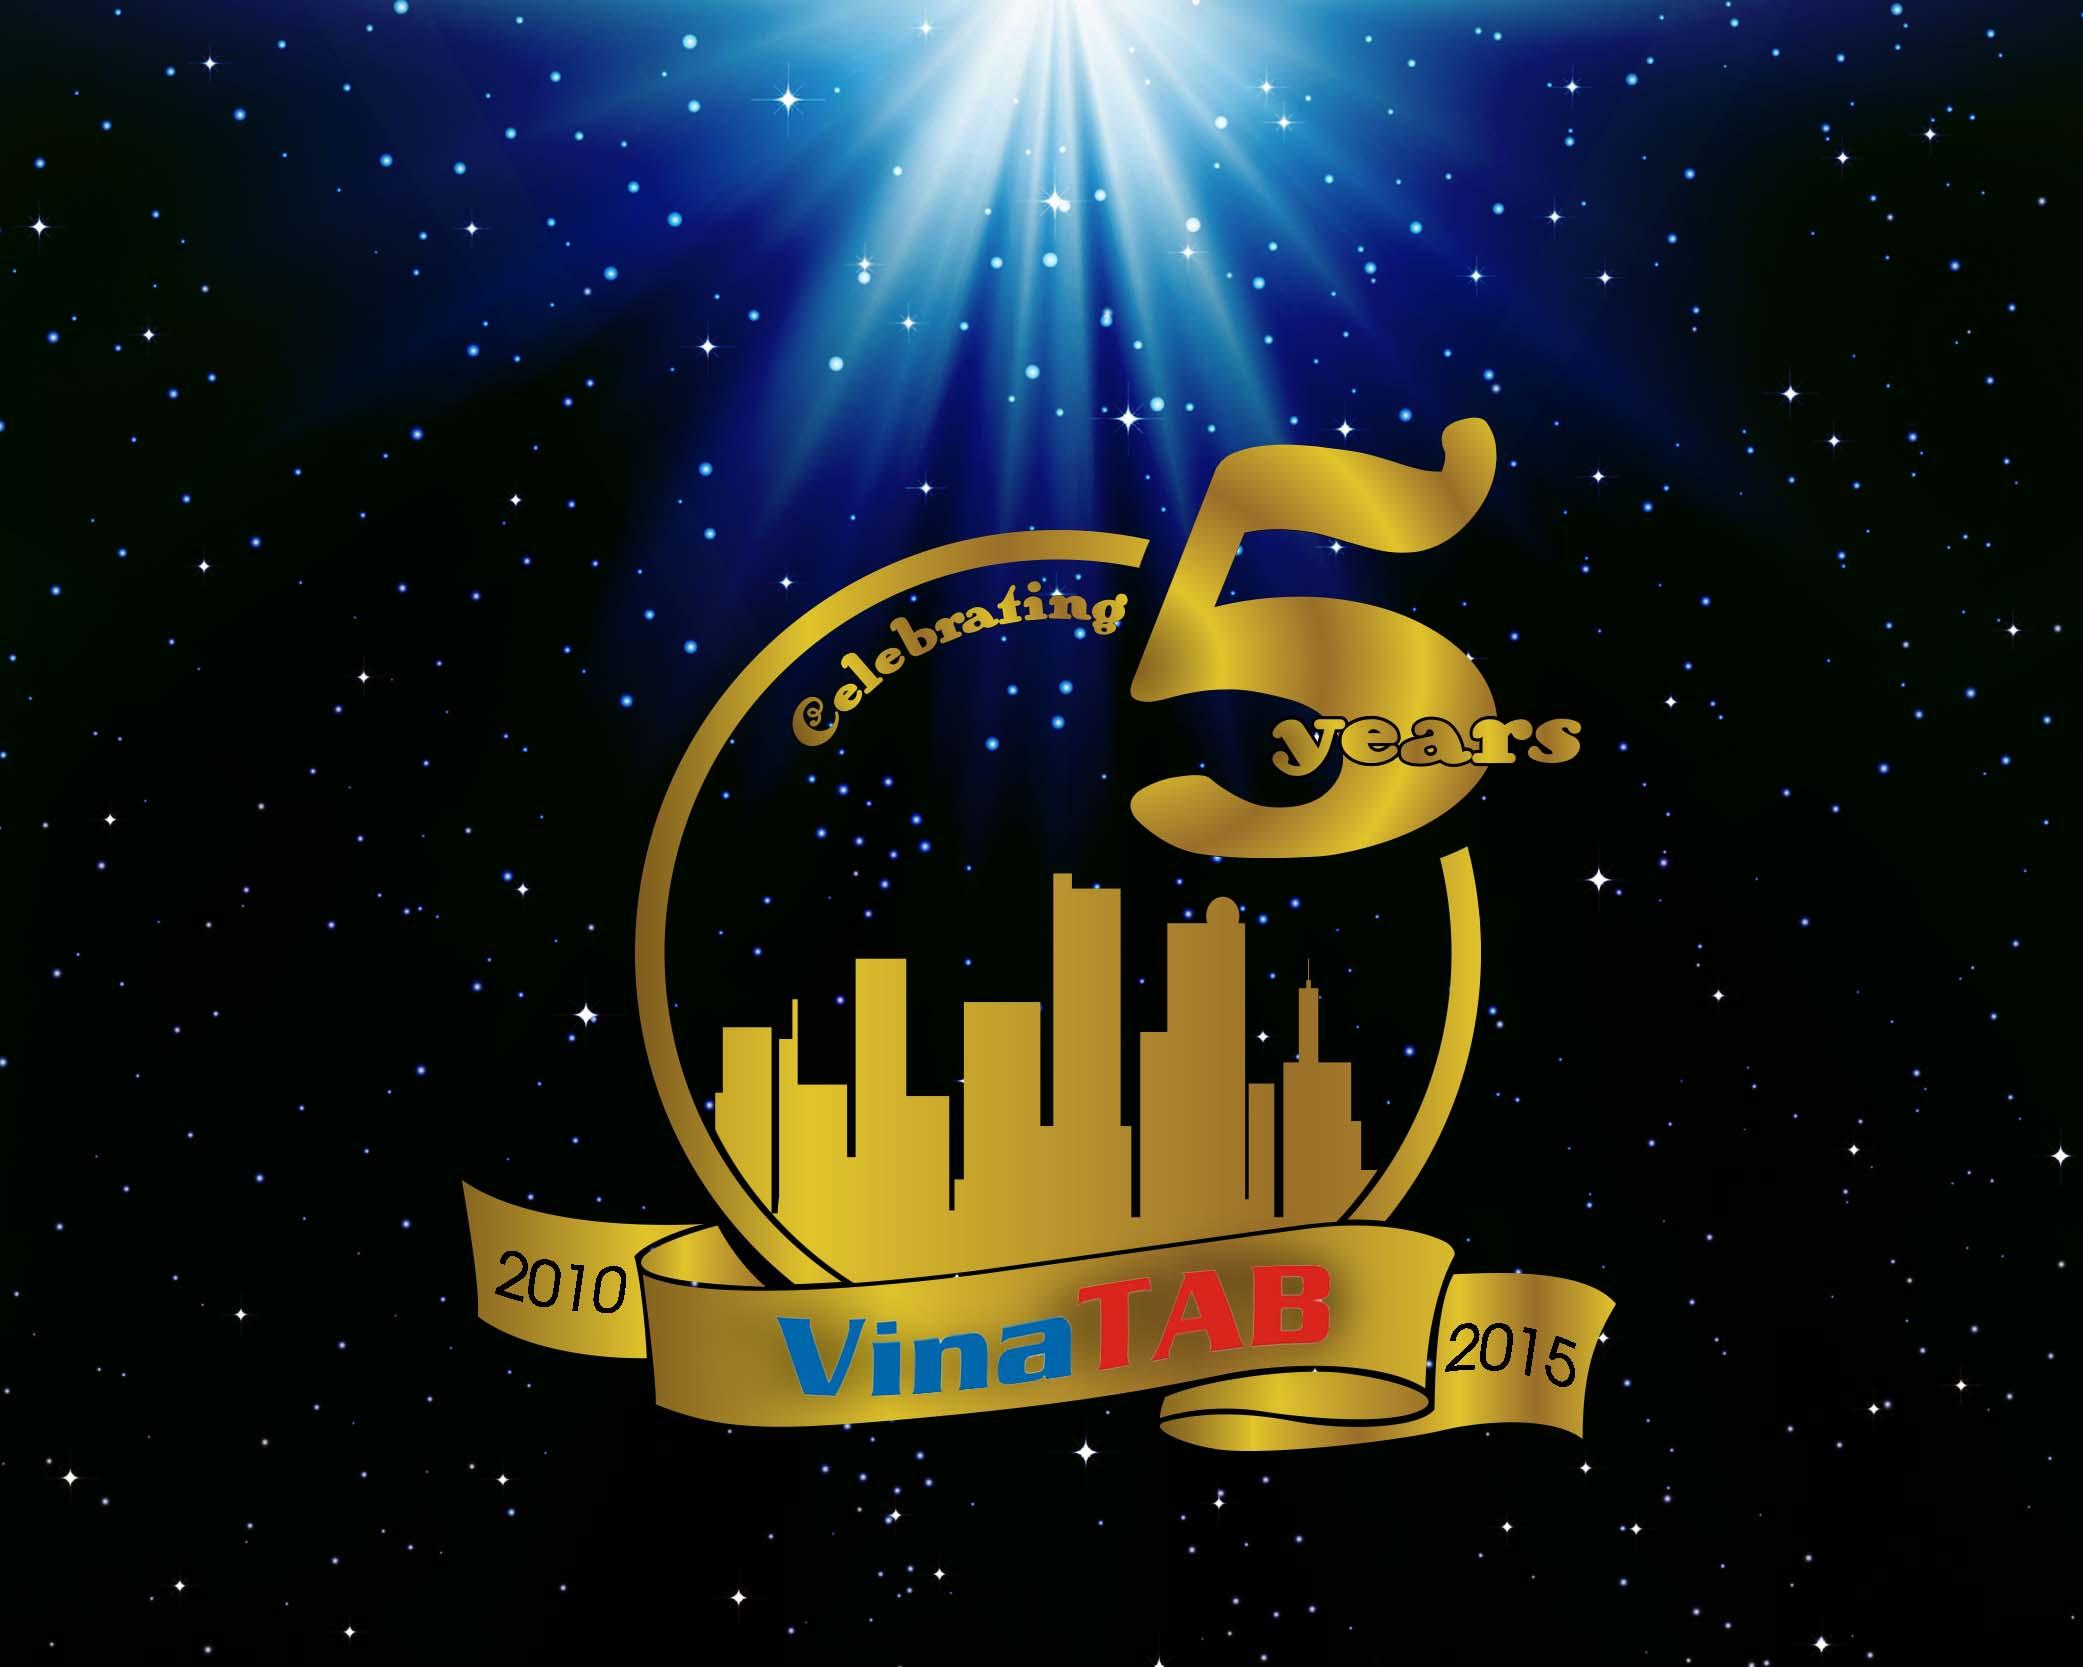 ky niem thanh lập VInaTAB, Karalux, VinaTAB tại Việt Nam